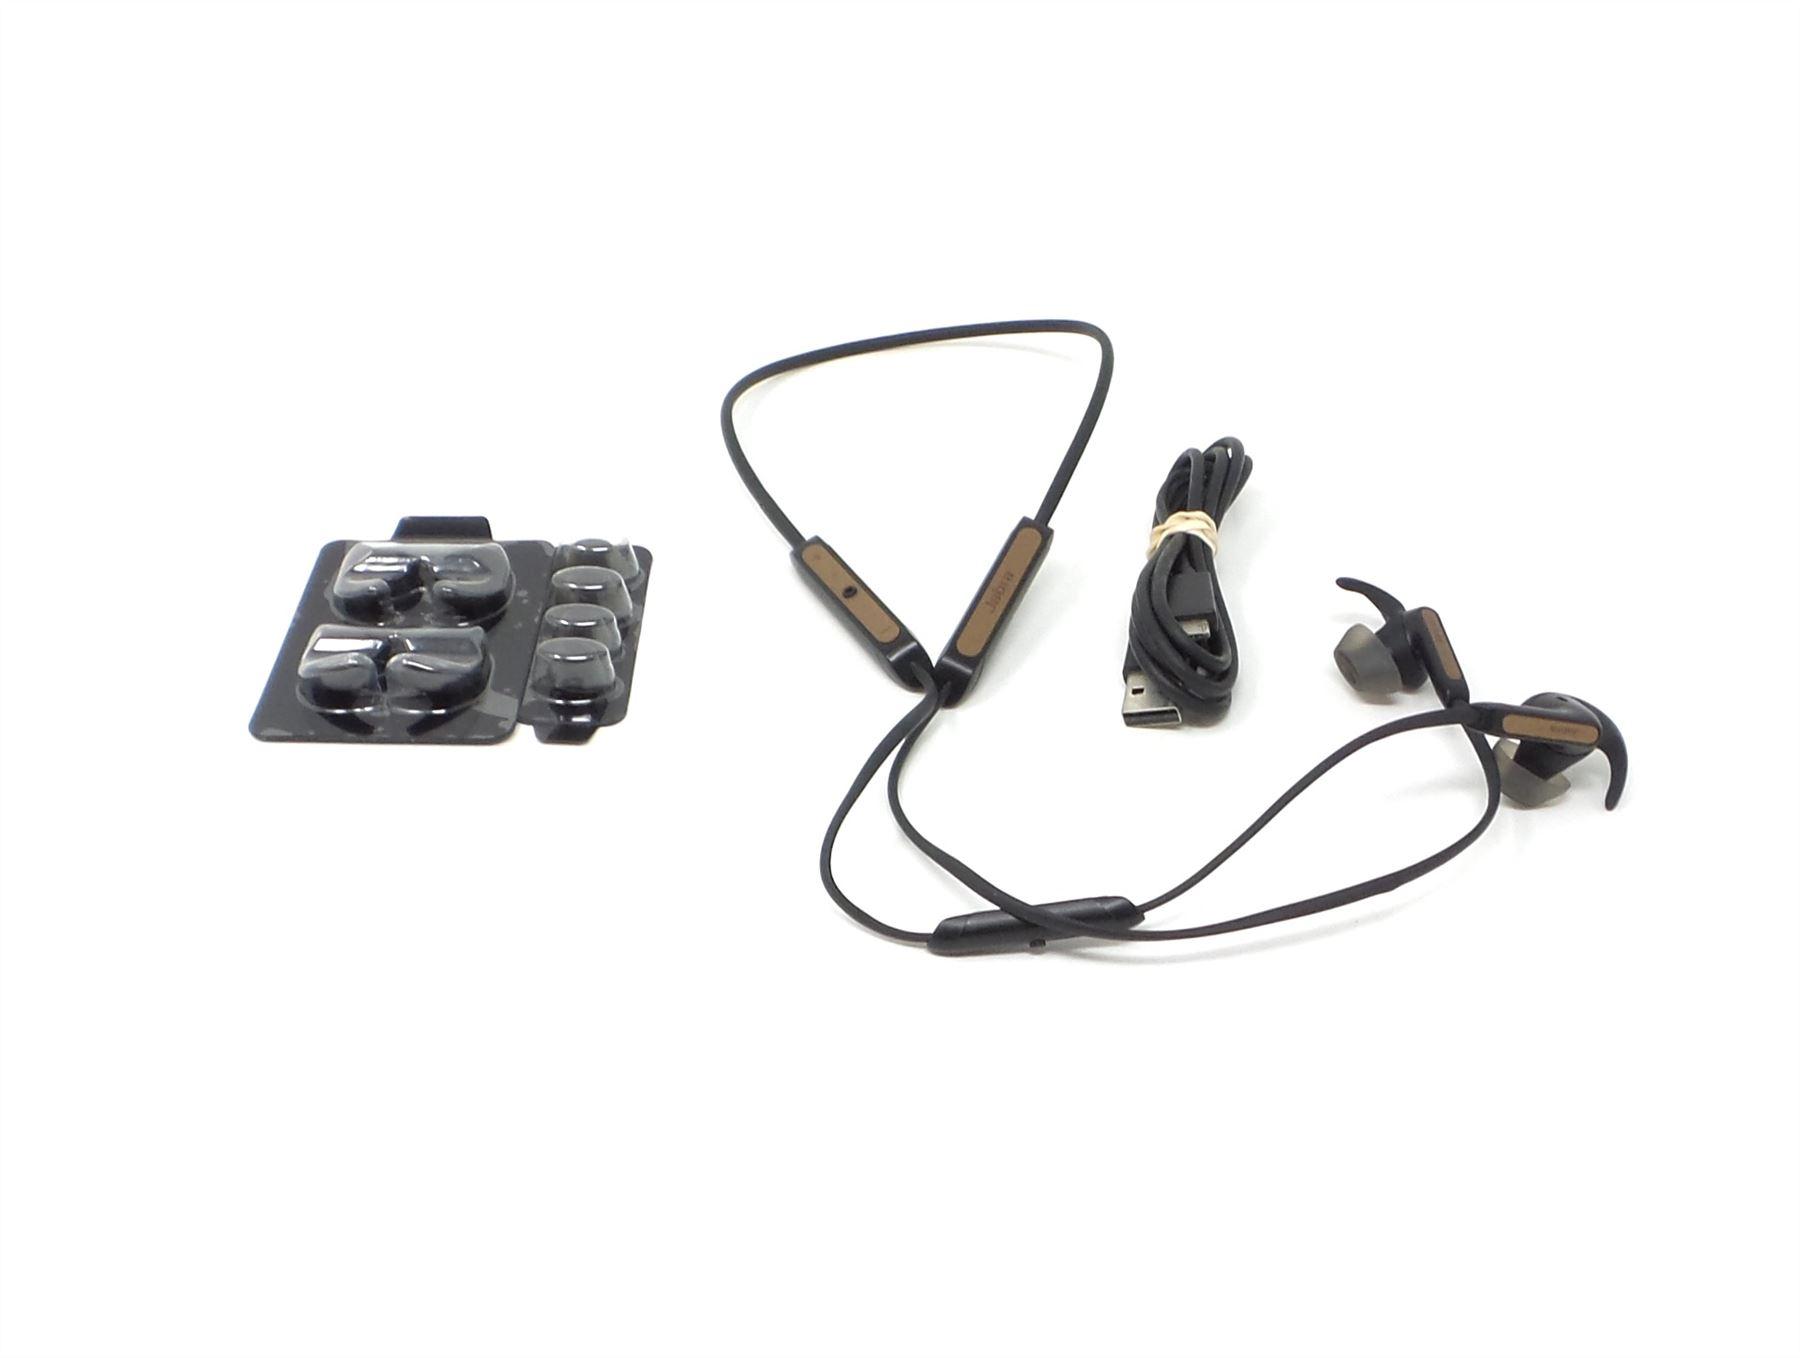 dd91689d8ba Jabra Elite 45e Wireless Bluetooth Headset 100-98900001-02 Copper Black